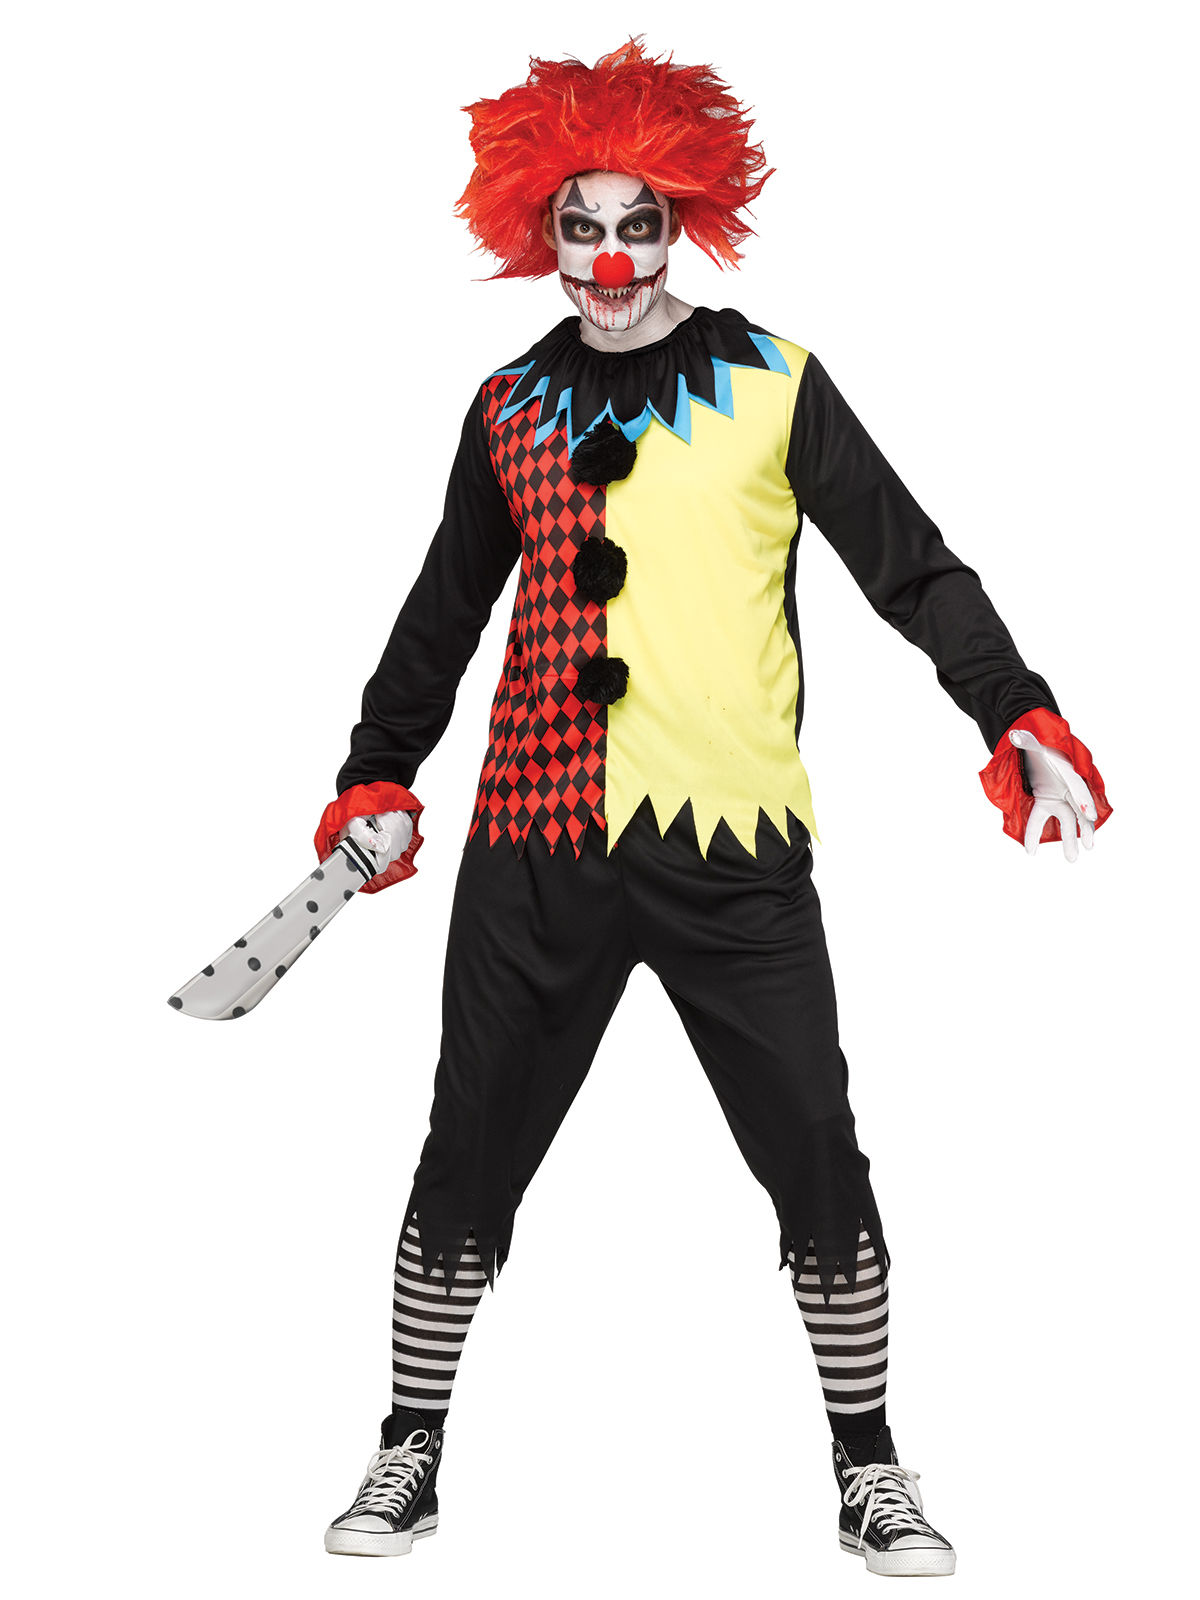 Halloween Kostüme Herren Inspirierend Verrückter Zirkus Clown Halloween Kostüm Für Herren Bunt